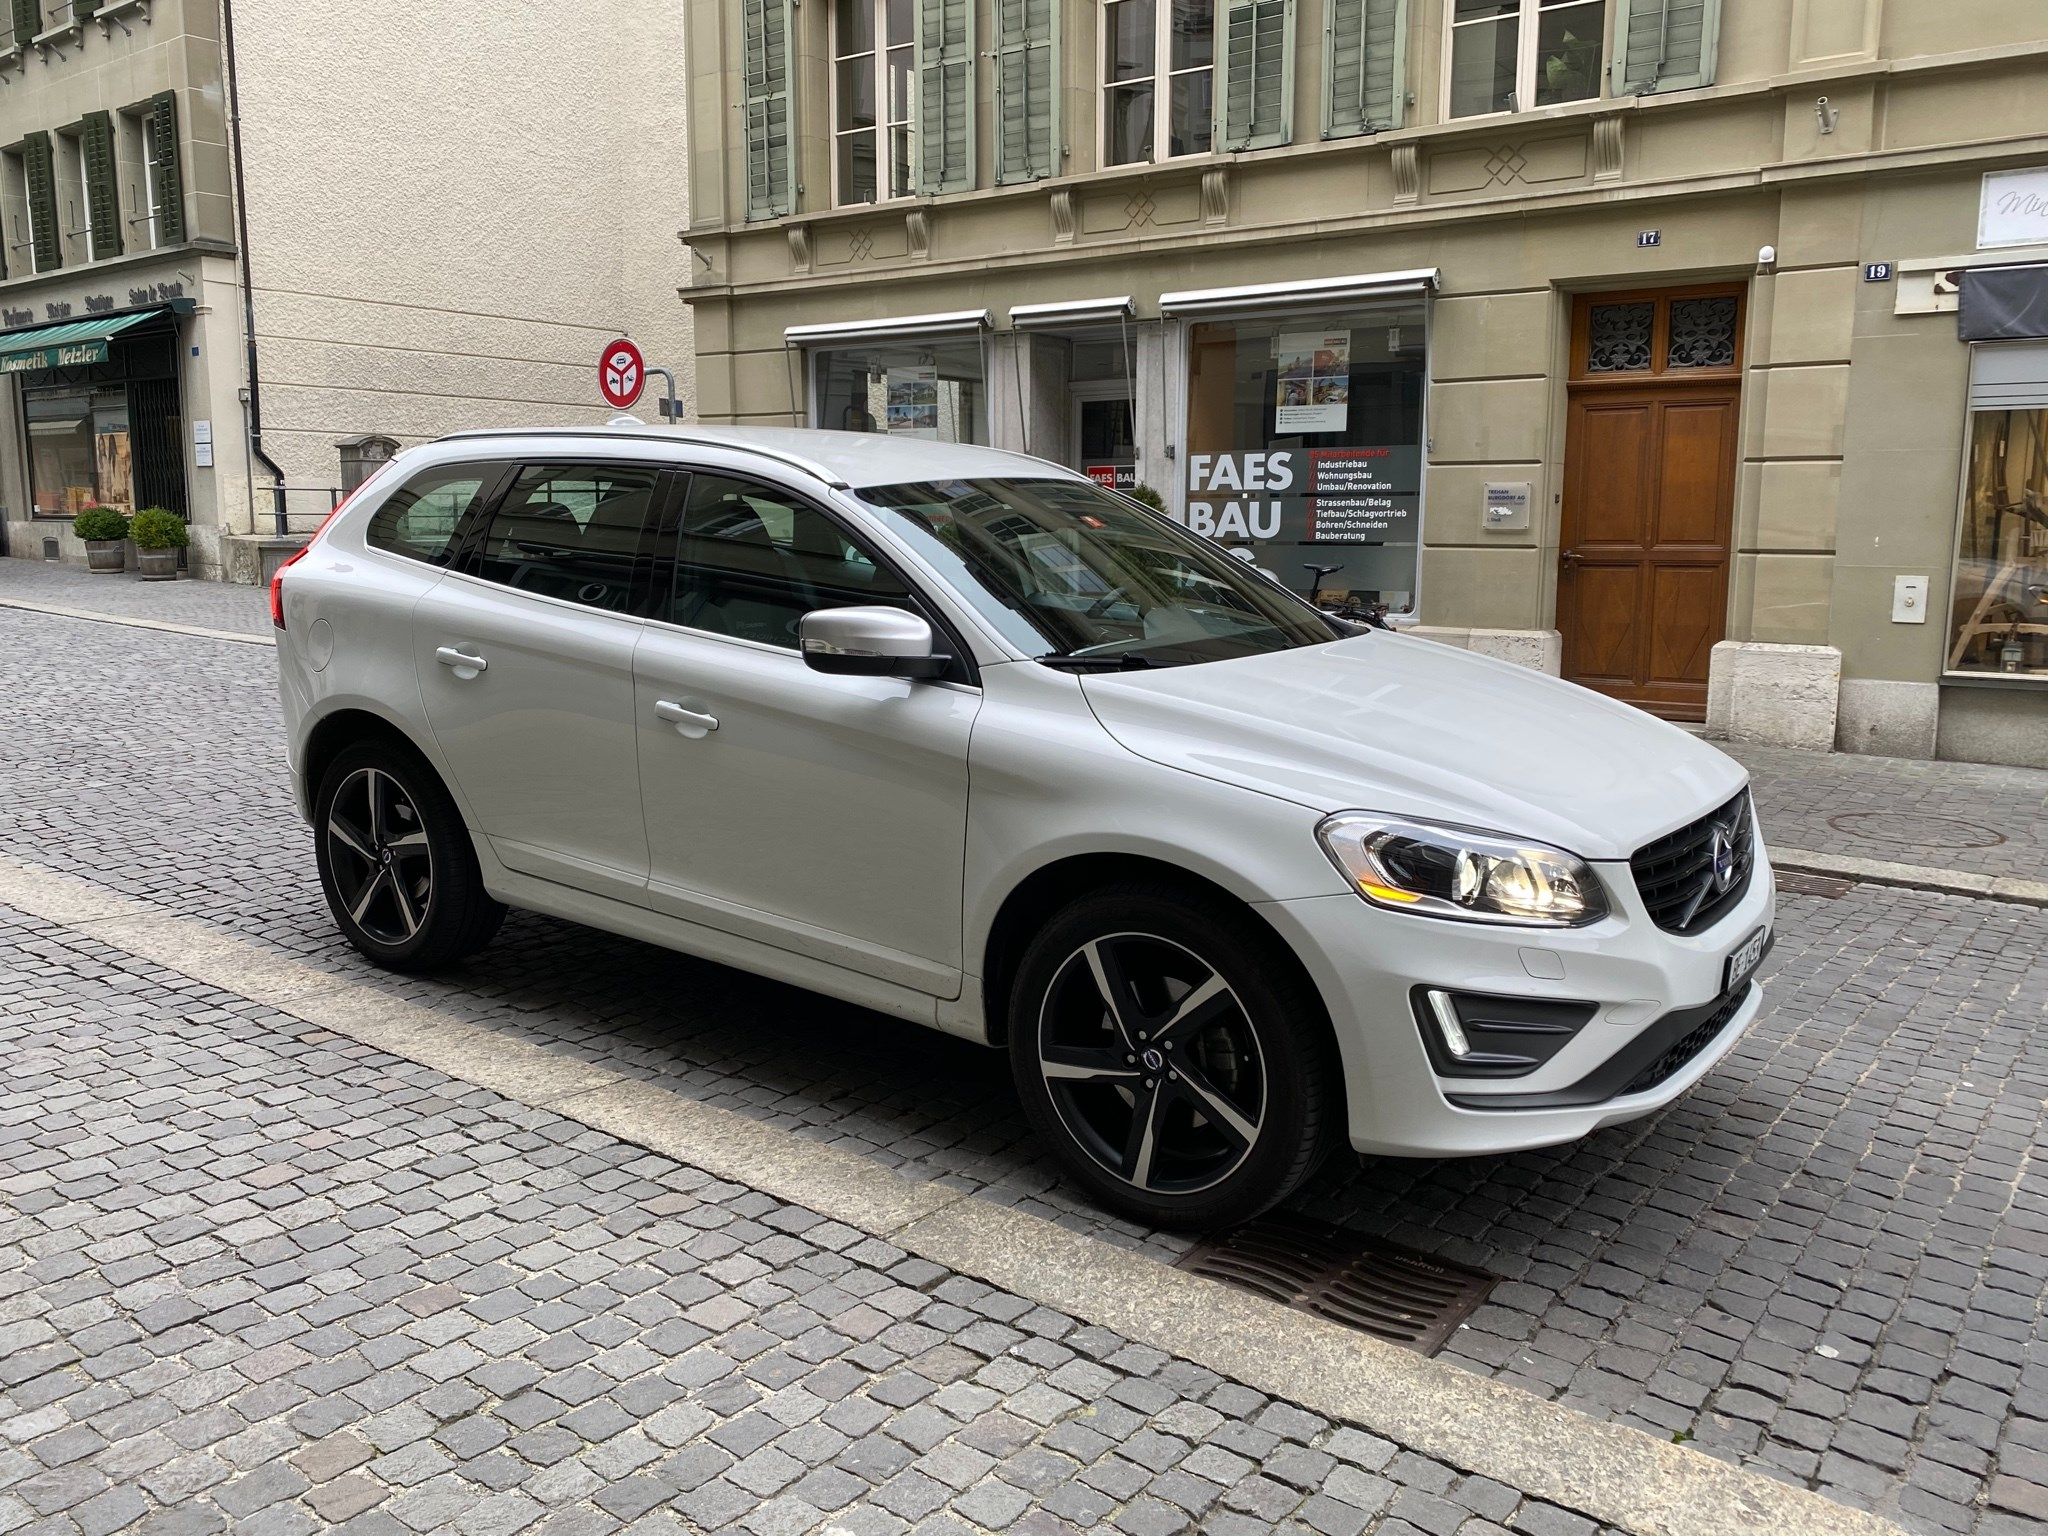 Volvo XC60 2.4 D5 Momentum R-Design AWD